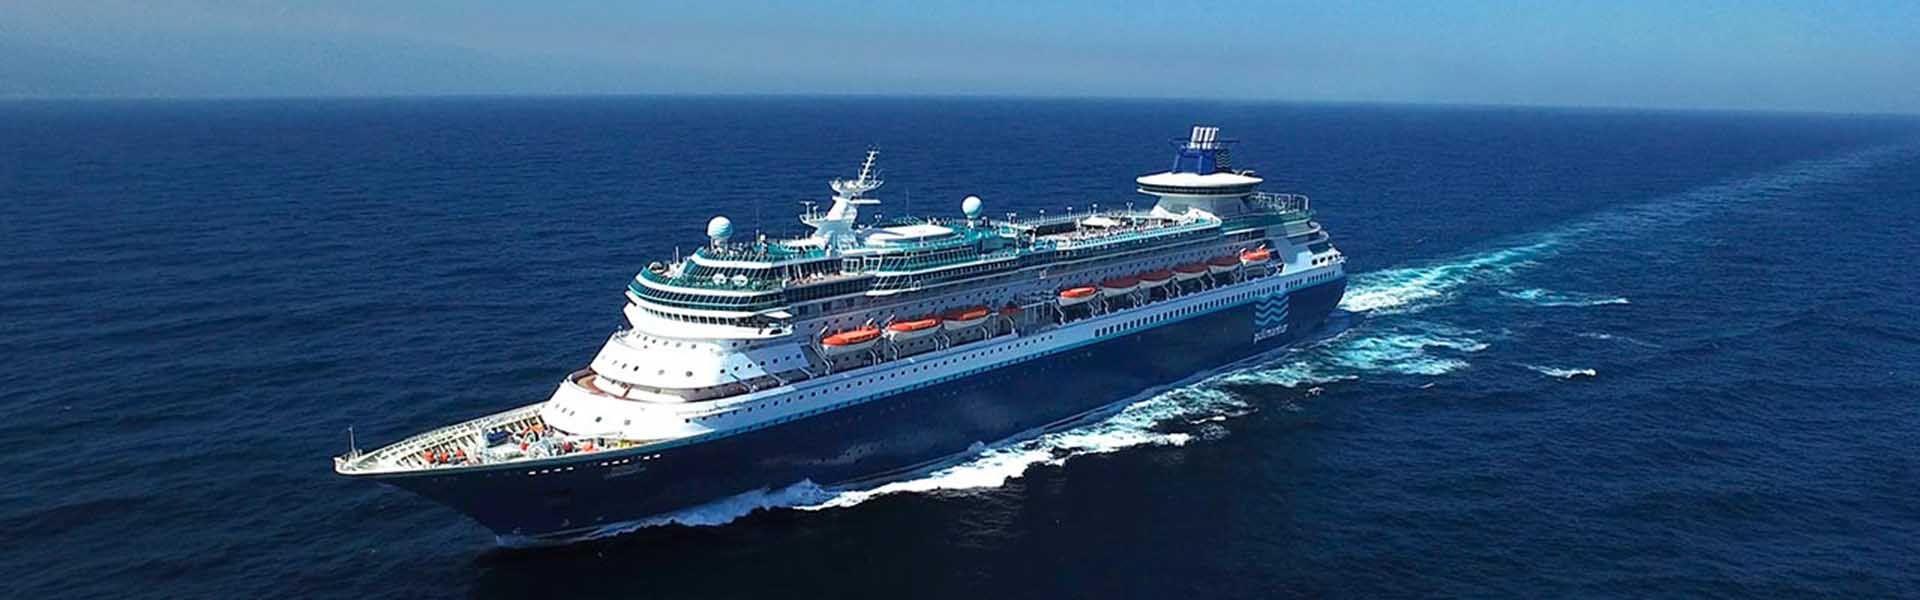 Croaziera 2017 - Europa de Vest (Vigo) - Pullmantur Cruises - Monarch - 8 nopti